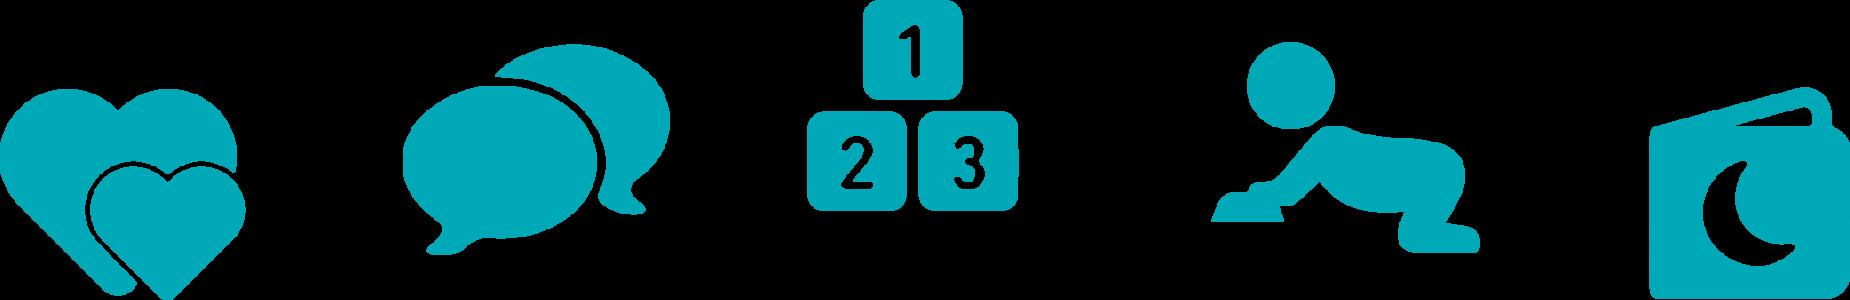 CH-Basics-icons-02